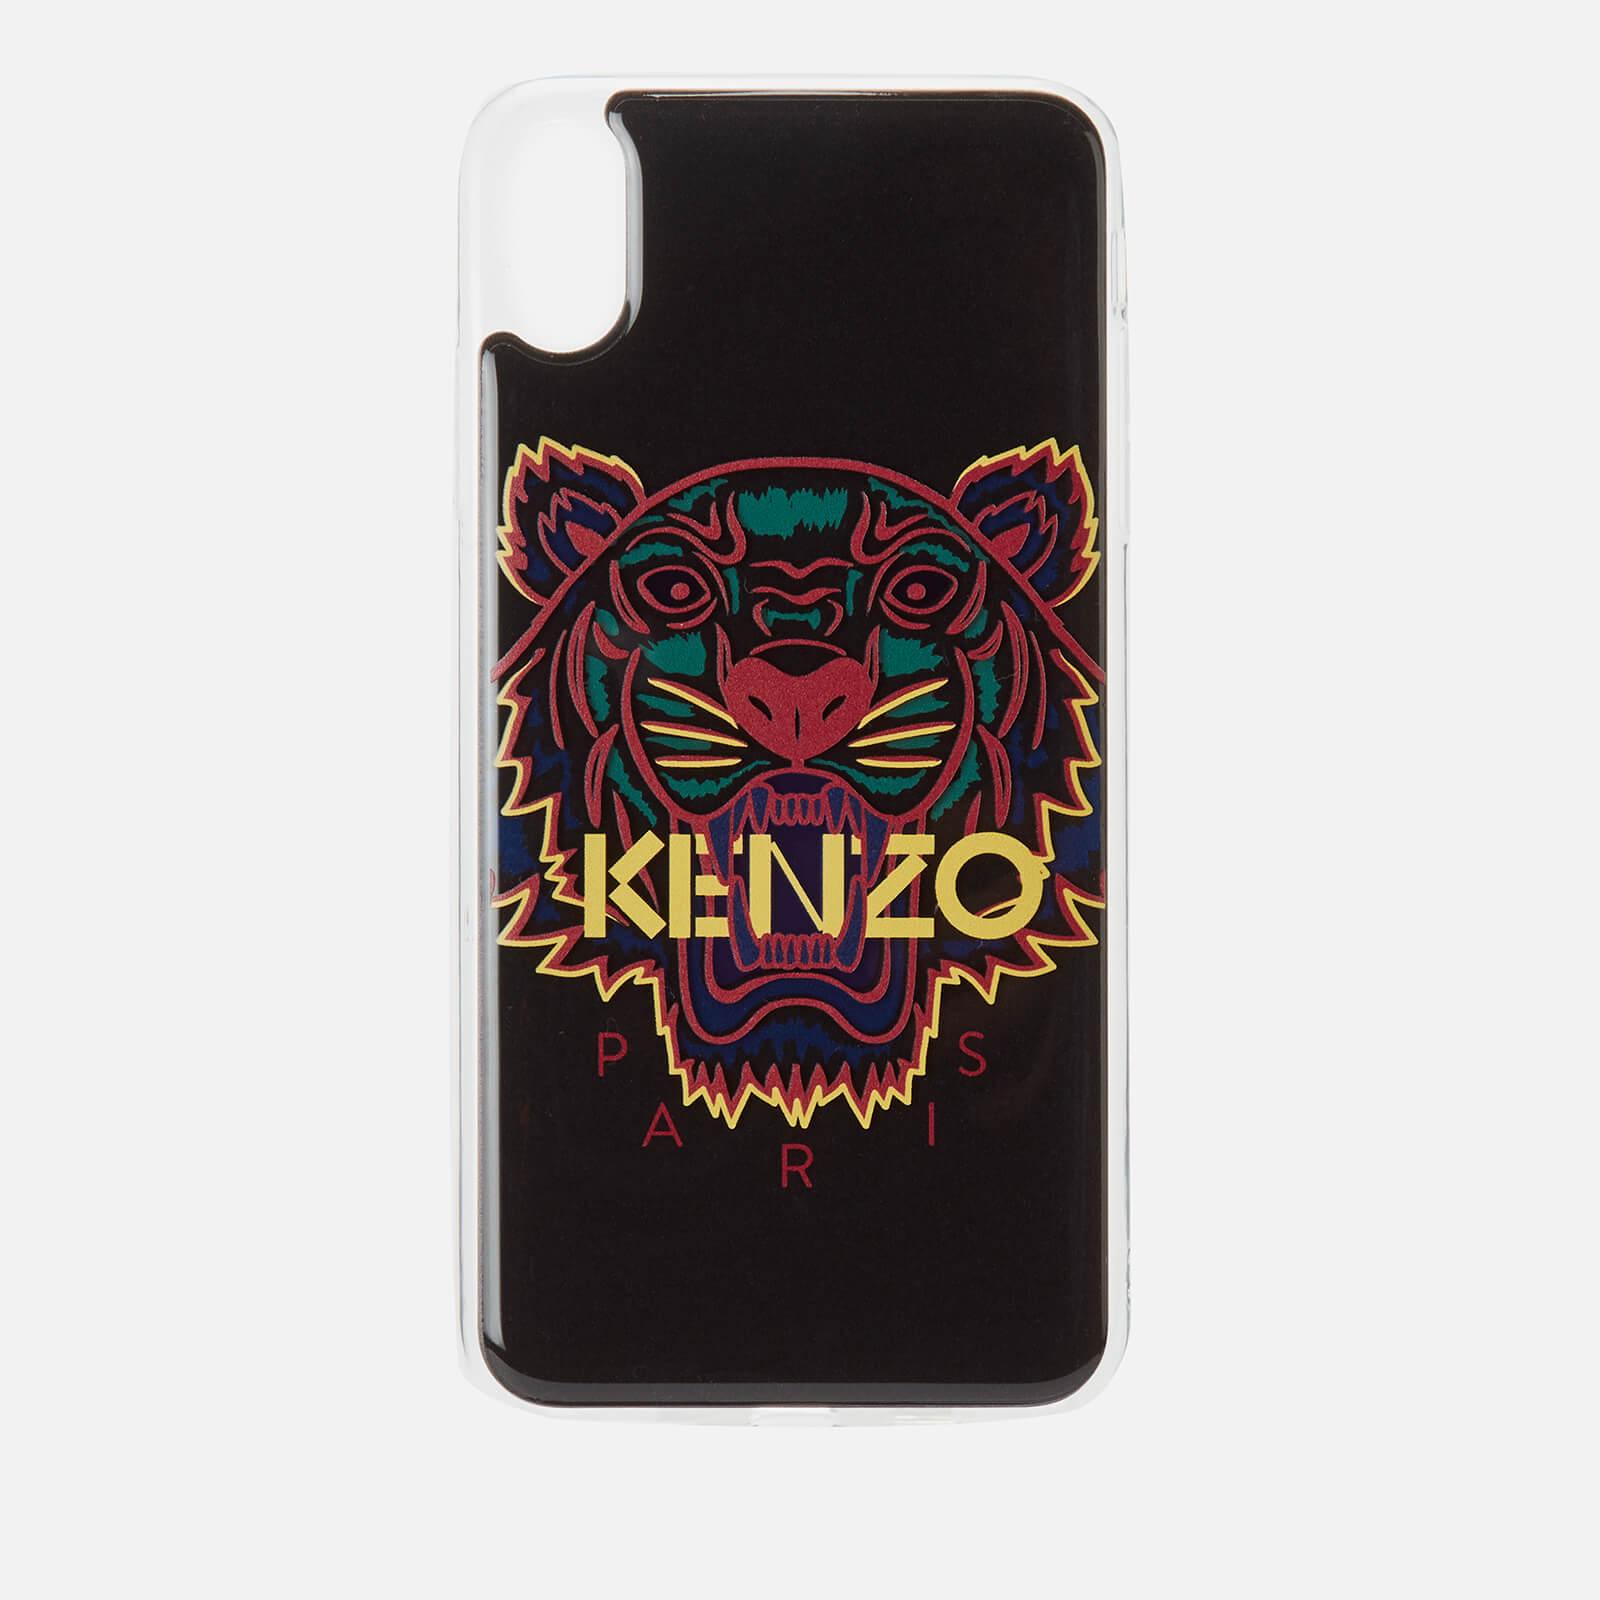 5a315c6d9a KENZO iPhone X Max Case - Black/Purple